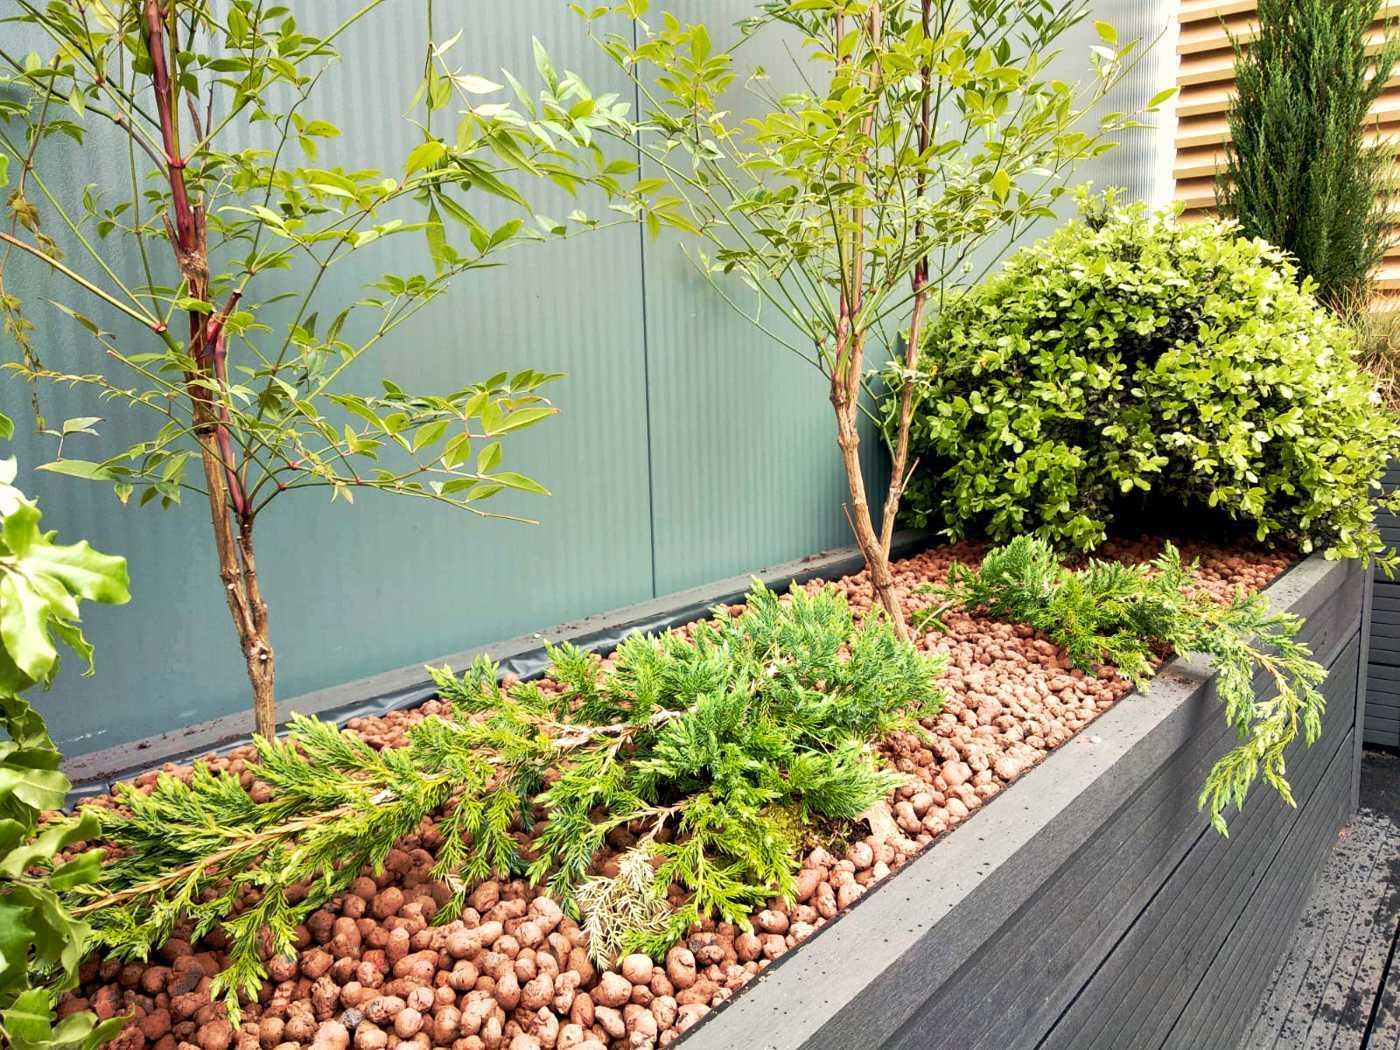 Willowbrook - Commercial Roof Garden